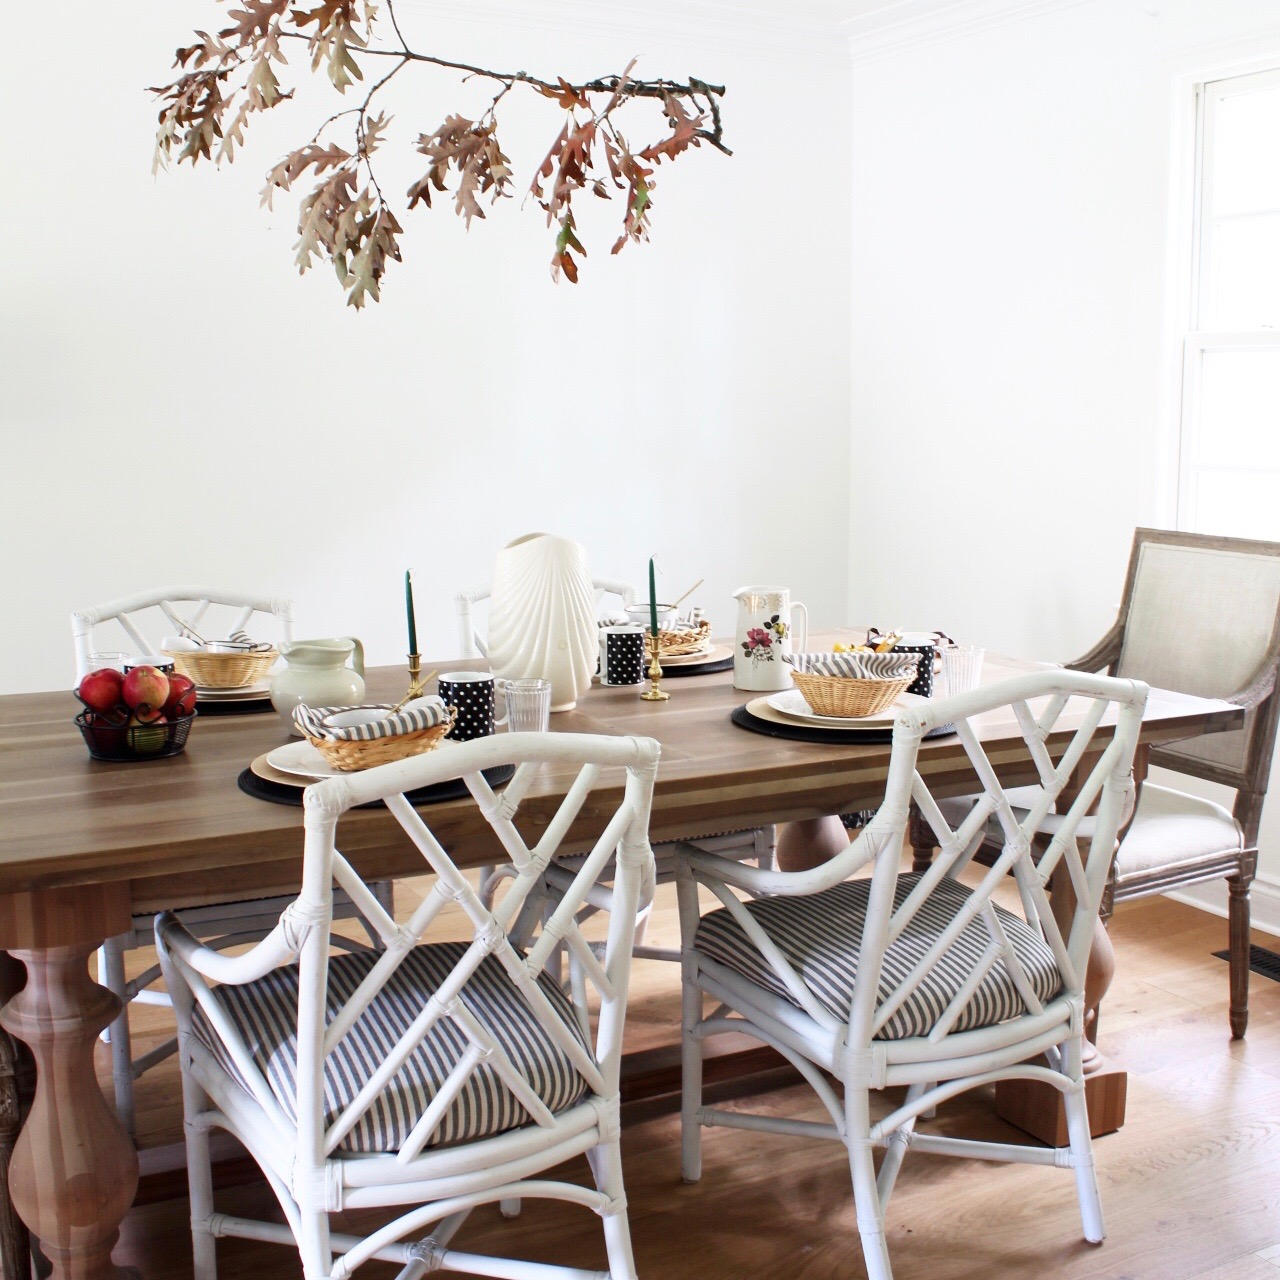 Thanksgiving Table for Brunch